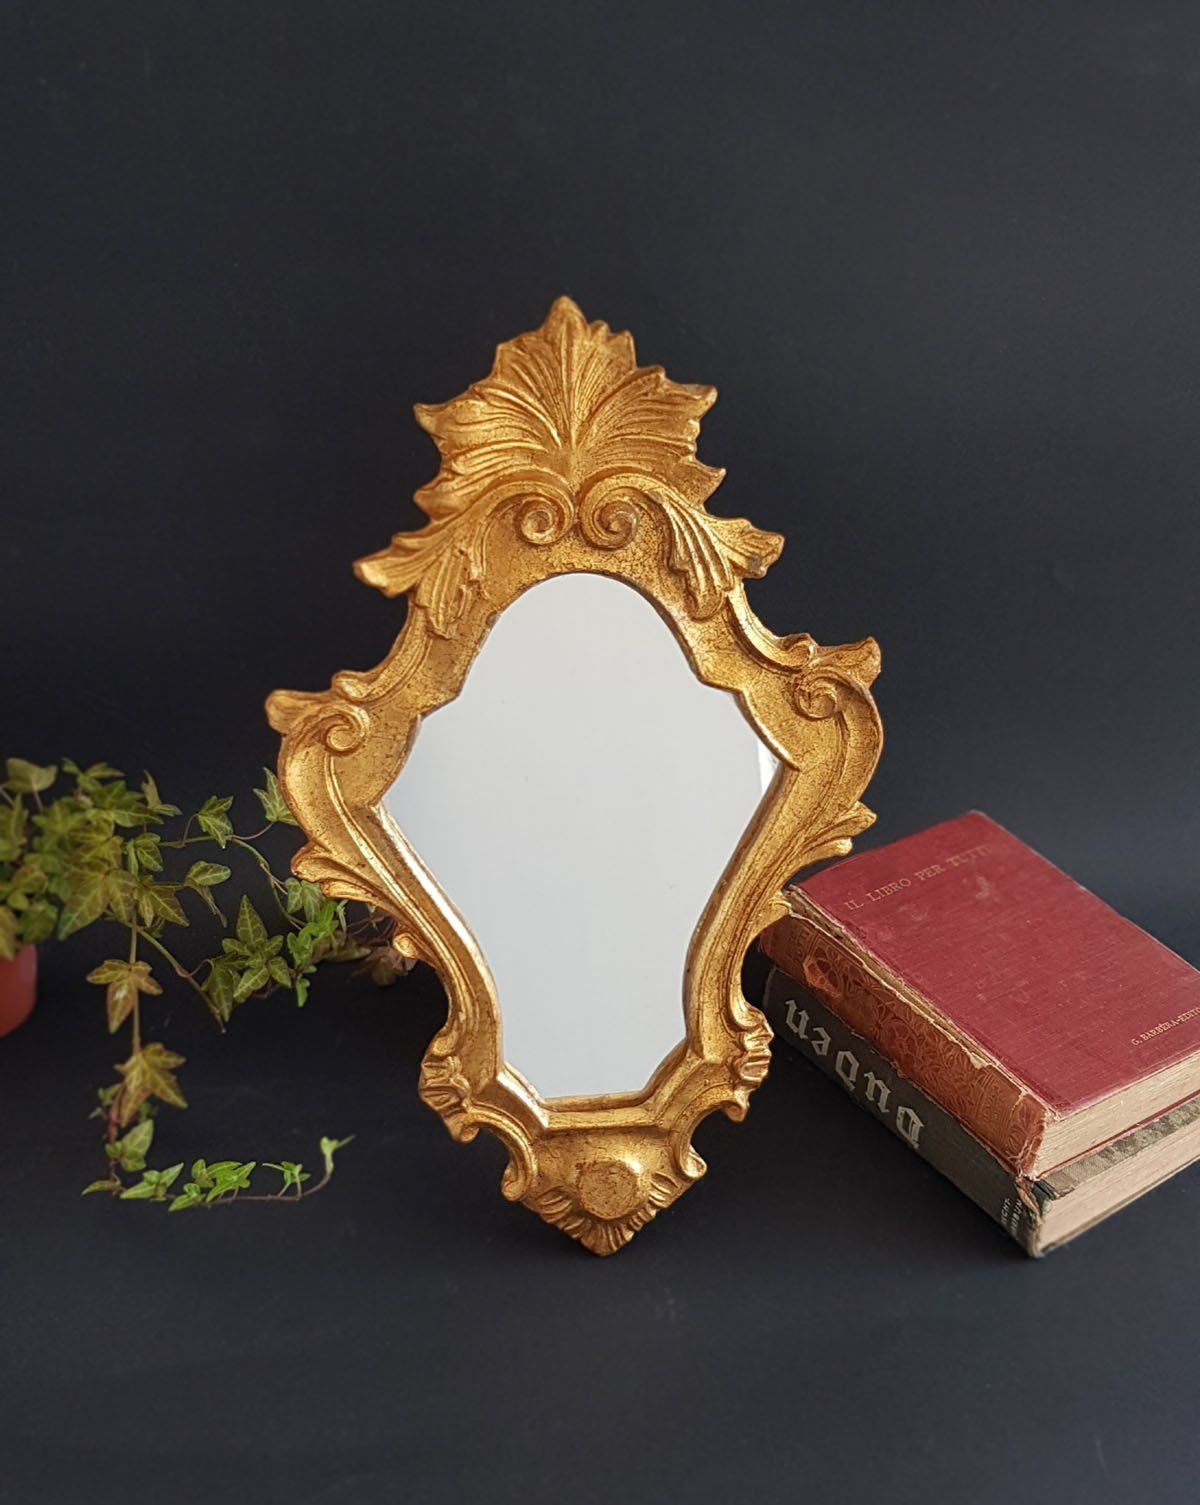 Antique Italian Wall Mirror Florentine Baroque Gilt Wall Mirror Ornate Carved Wood Frame Mirror Hollywood Re Mirror Wall Wood Framed Mirror Carved Wood Frame